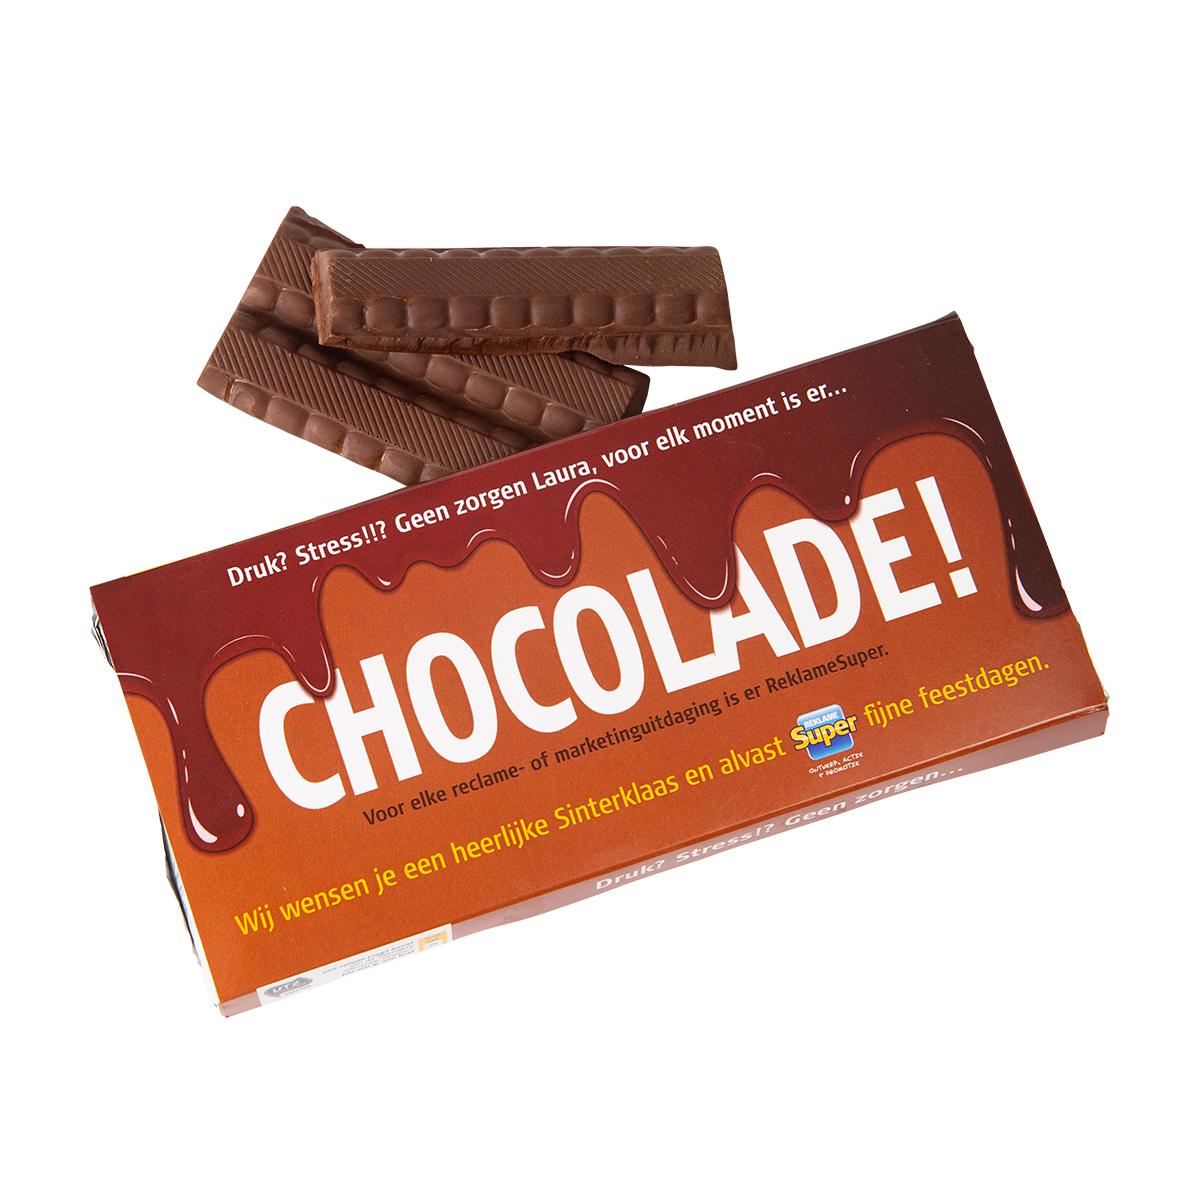 Mailing Chocolade 2017